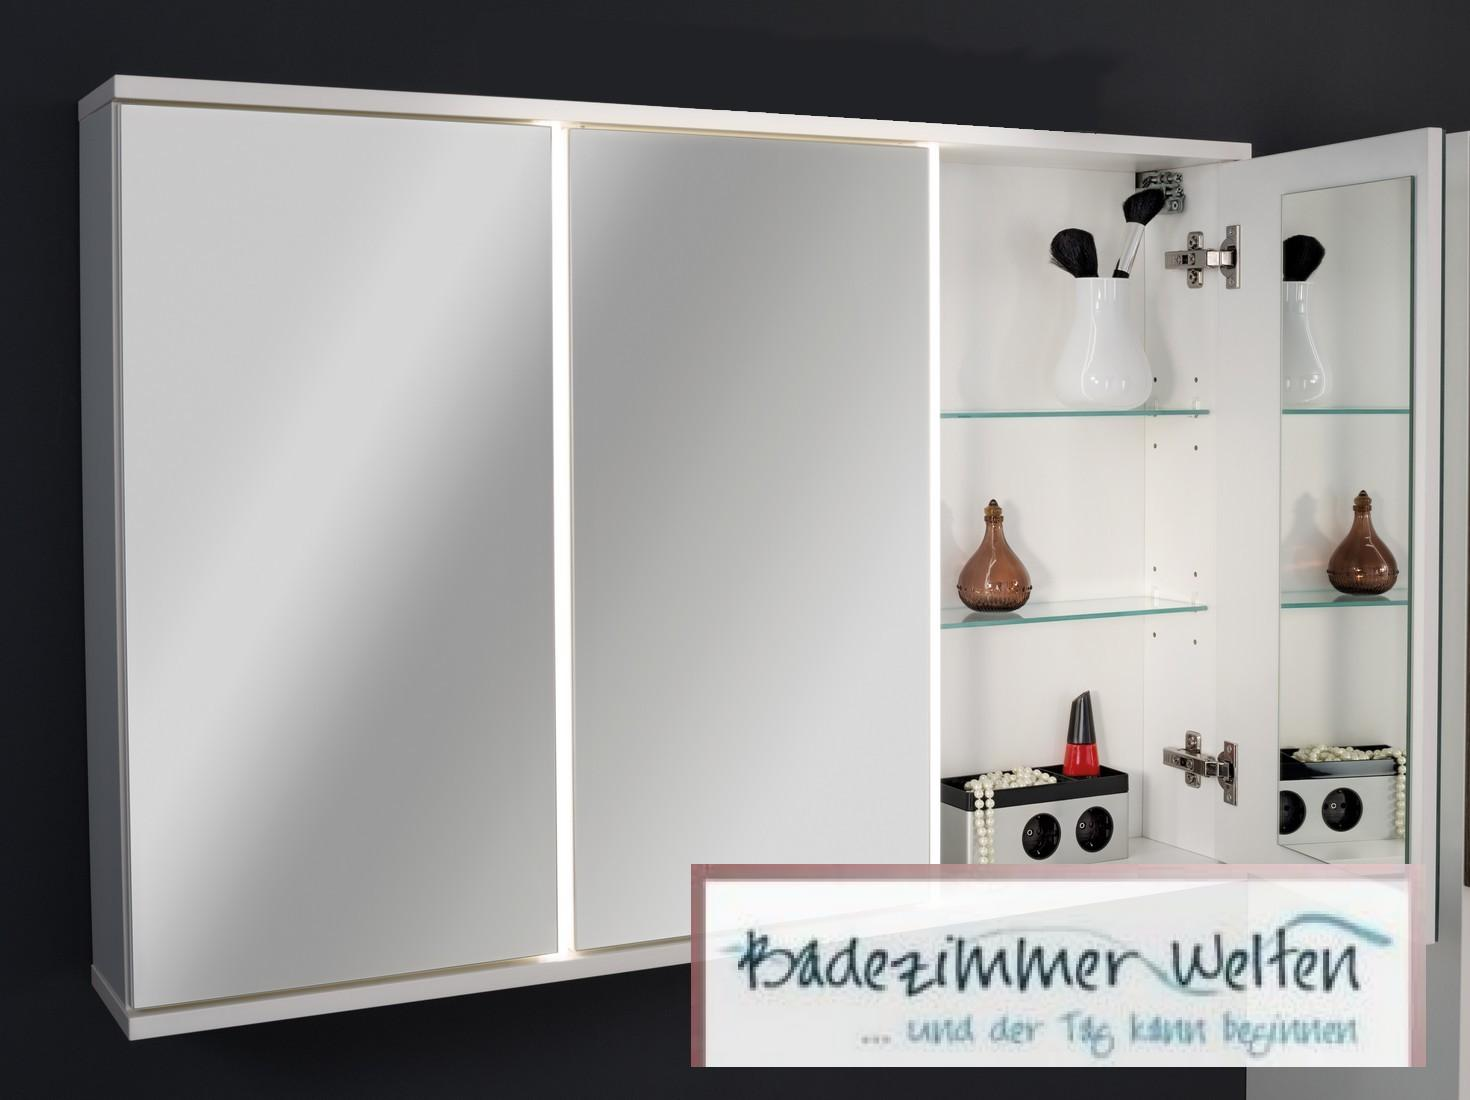 fackelmann spiegelschrank wei mit led 100 cm 3 t ren inklusive sensor ebay. Black Bedroom Furniture Sets. Home Design Ideas